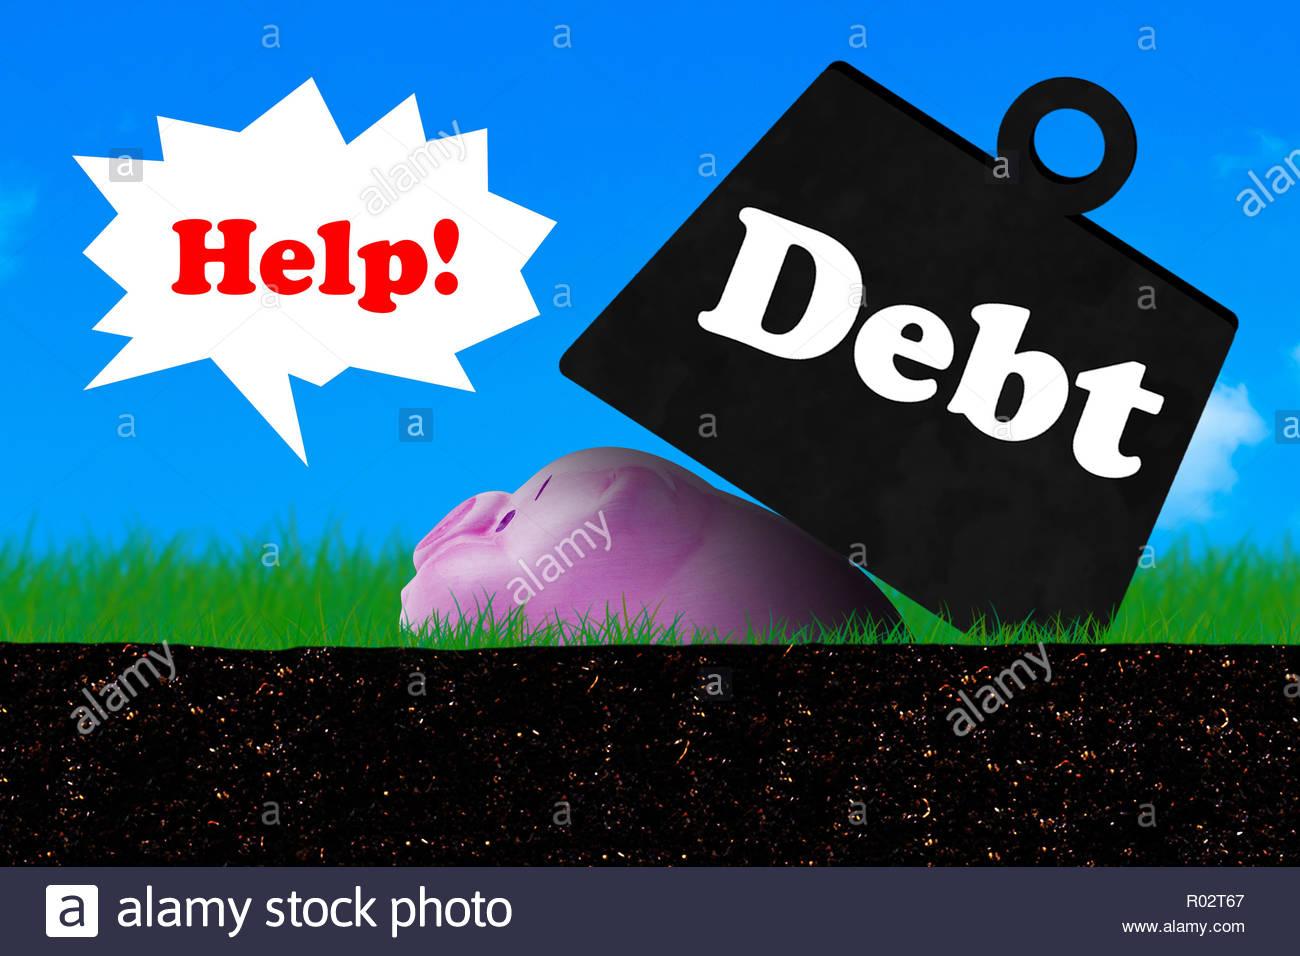 Debt concept financial crisis piggy bank on blue sky background 1300x956